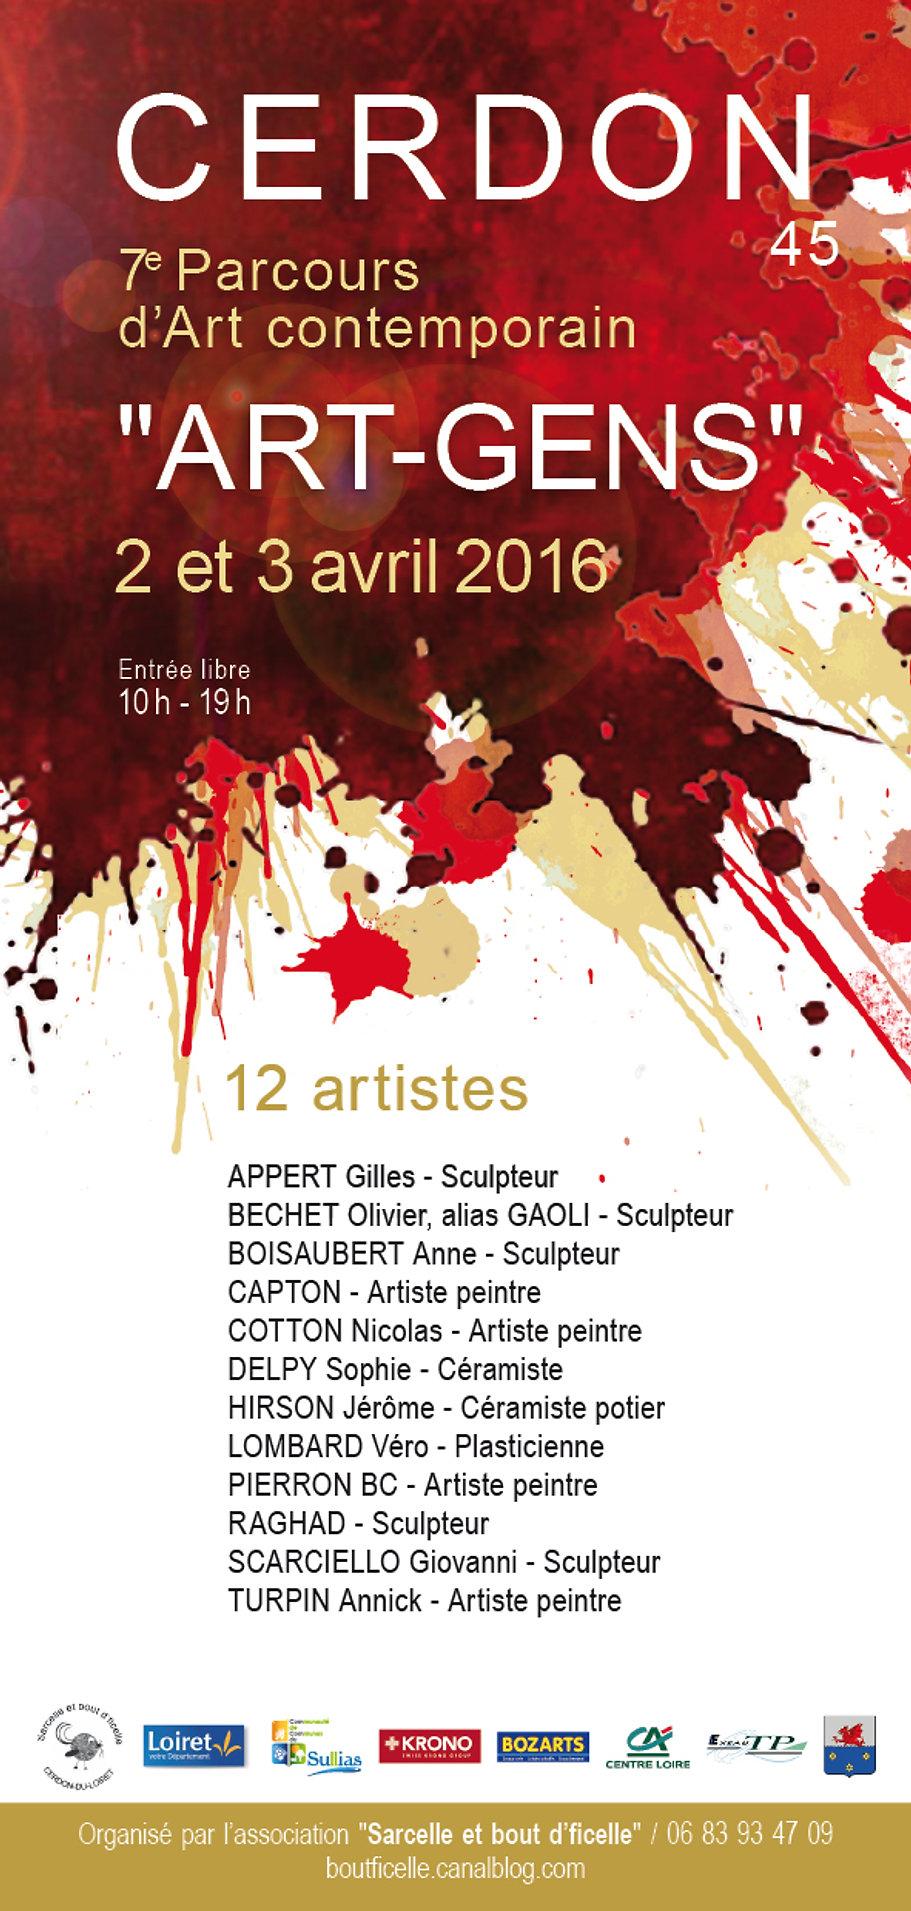 Extrêmement Nicolas Cotton artiste peintre | ACTU JB24